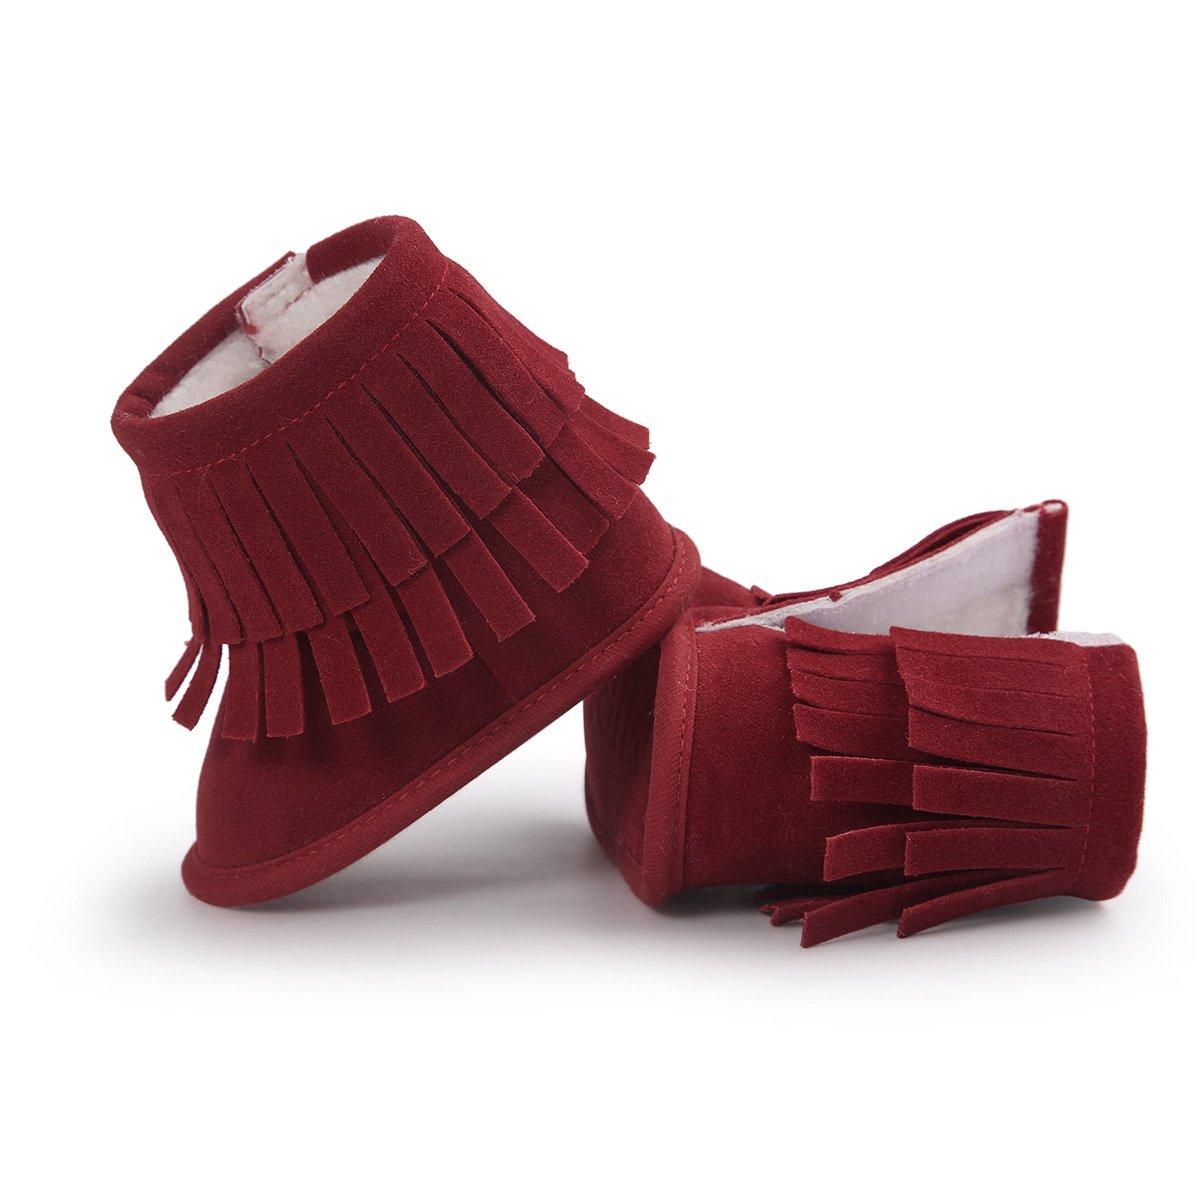 Butterme Zapatillas de Deporte de Beb/é Felpa C/álida Borla Zapatos Antideslizantes Prewalker Al Aire Libre de Nieve para 6-12 Meses 11cm,Rojo